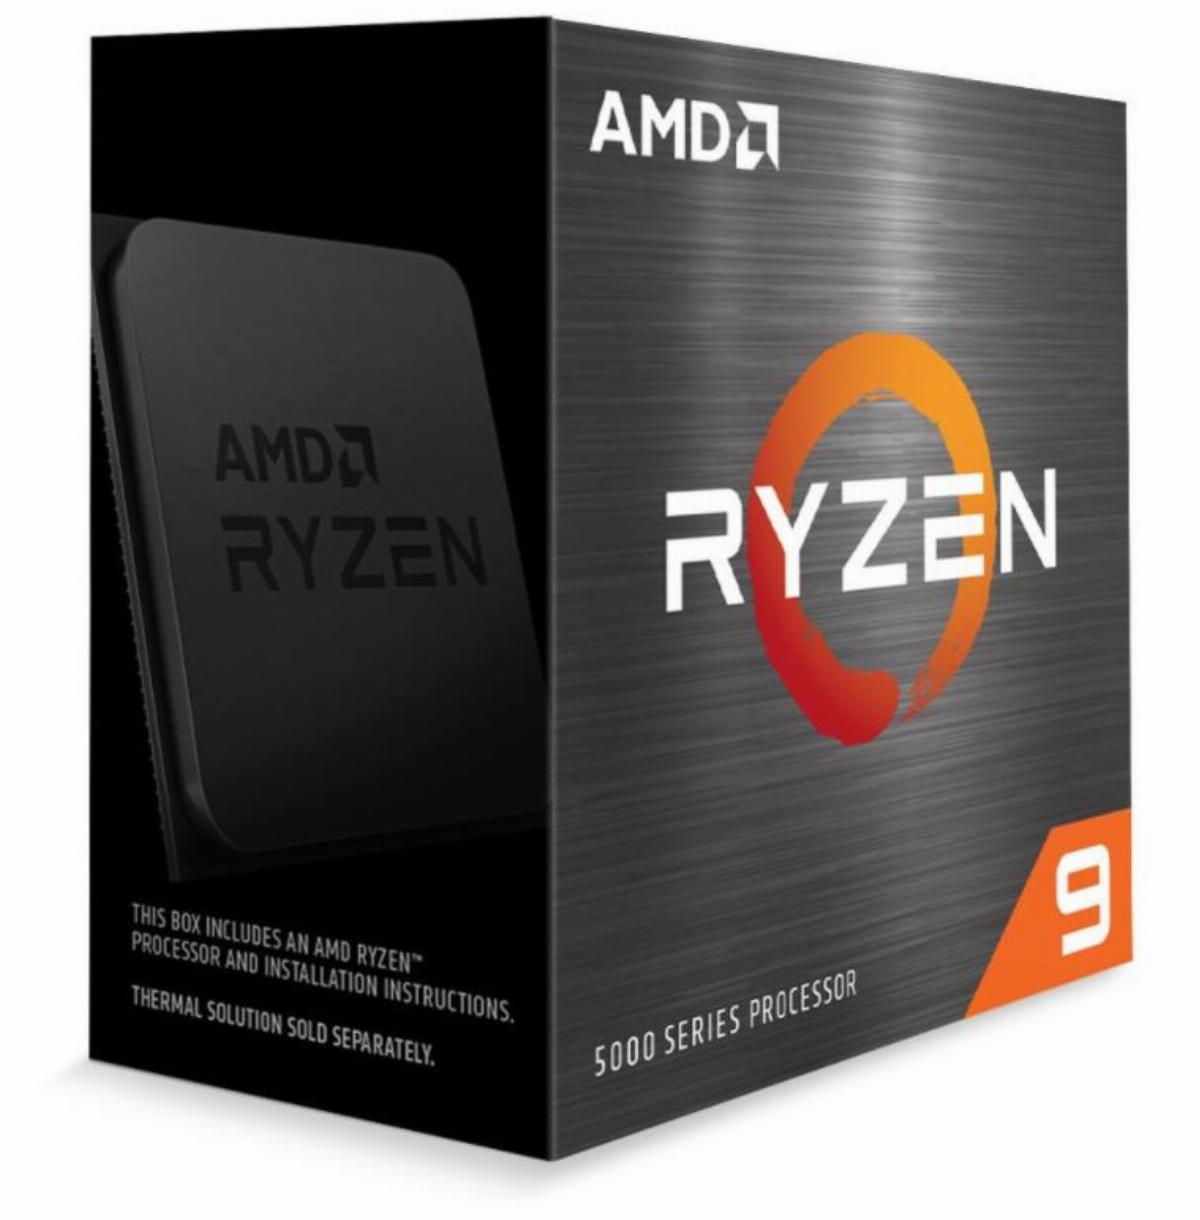 Процесор AMD Ryzen 9 5900X (4.8GHz Max Boost,70MB,105W,AM4) box Снимка 1